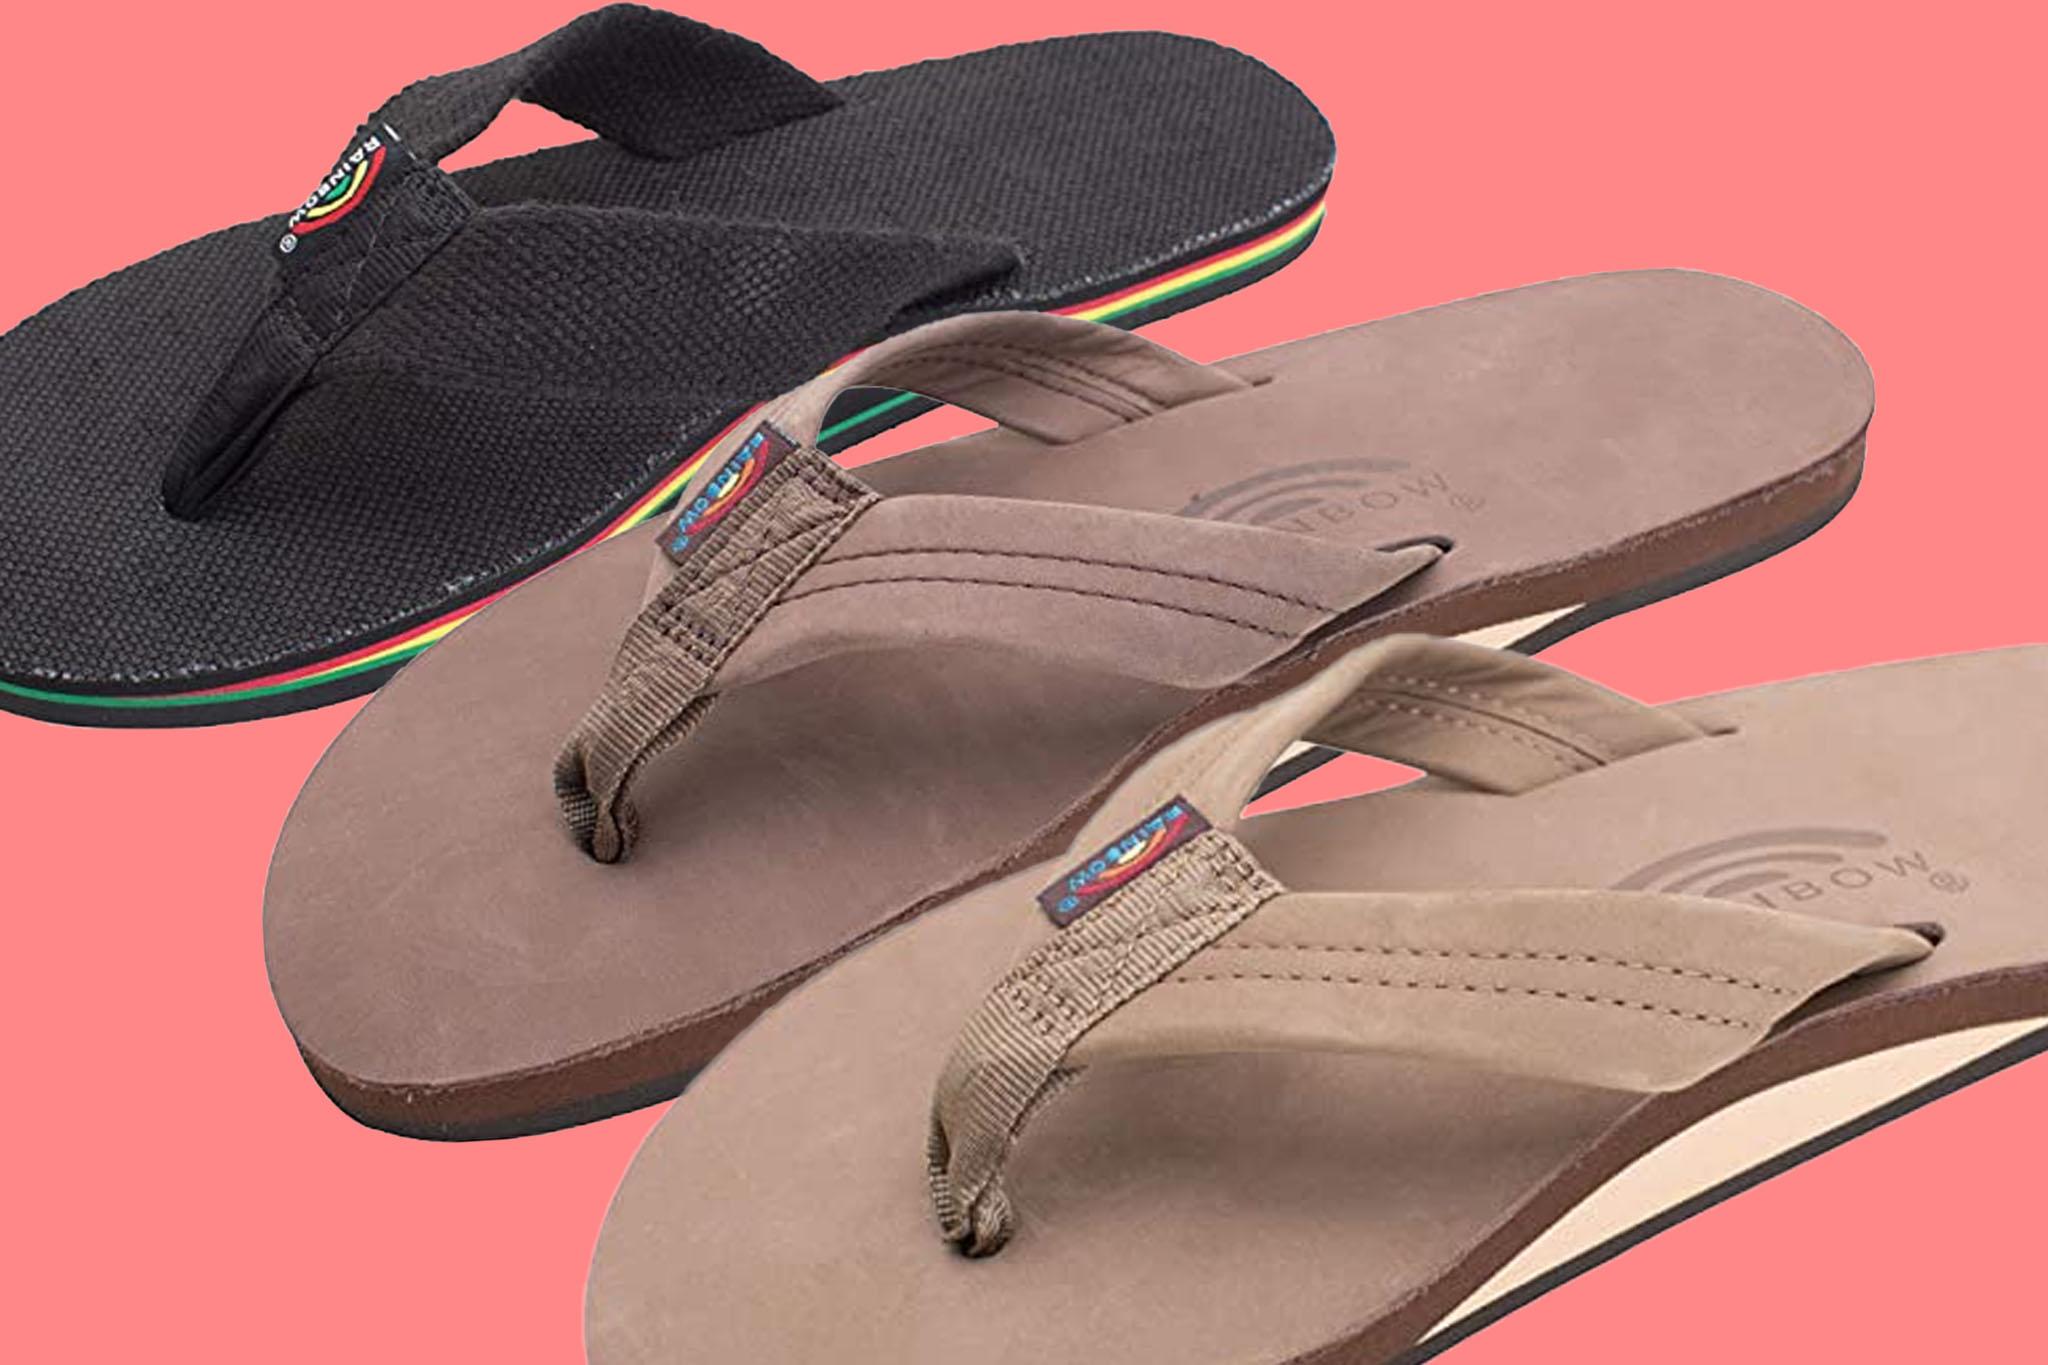 better than flip flops have